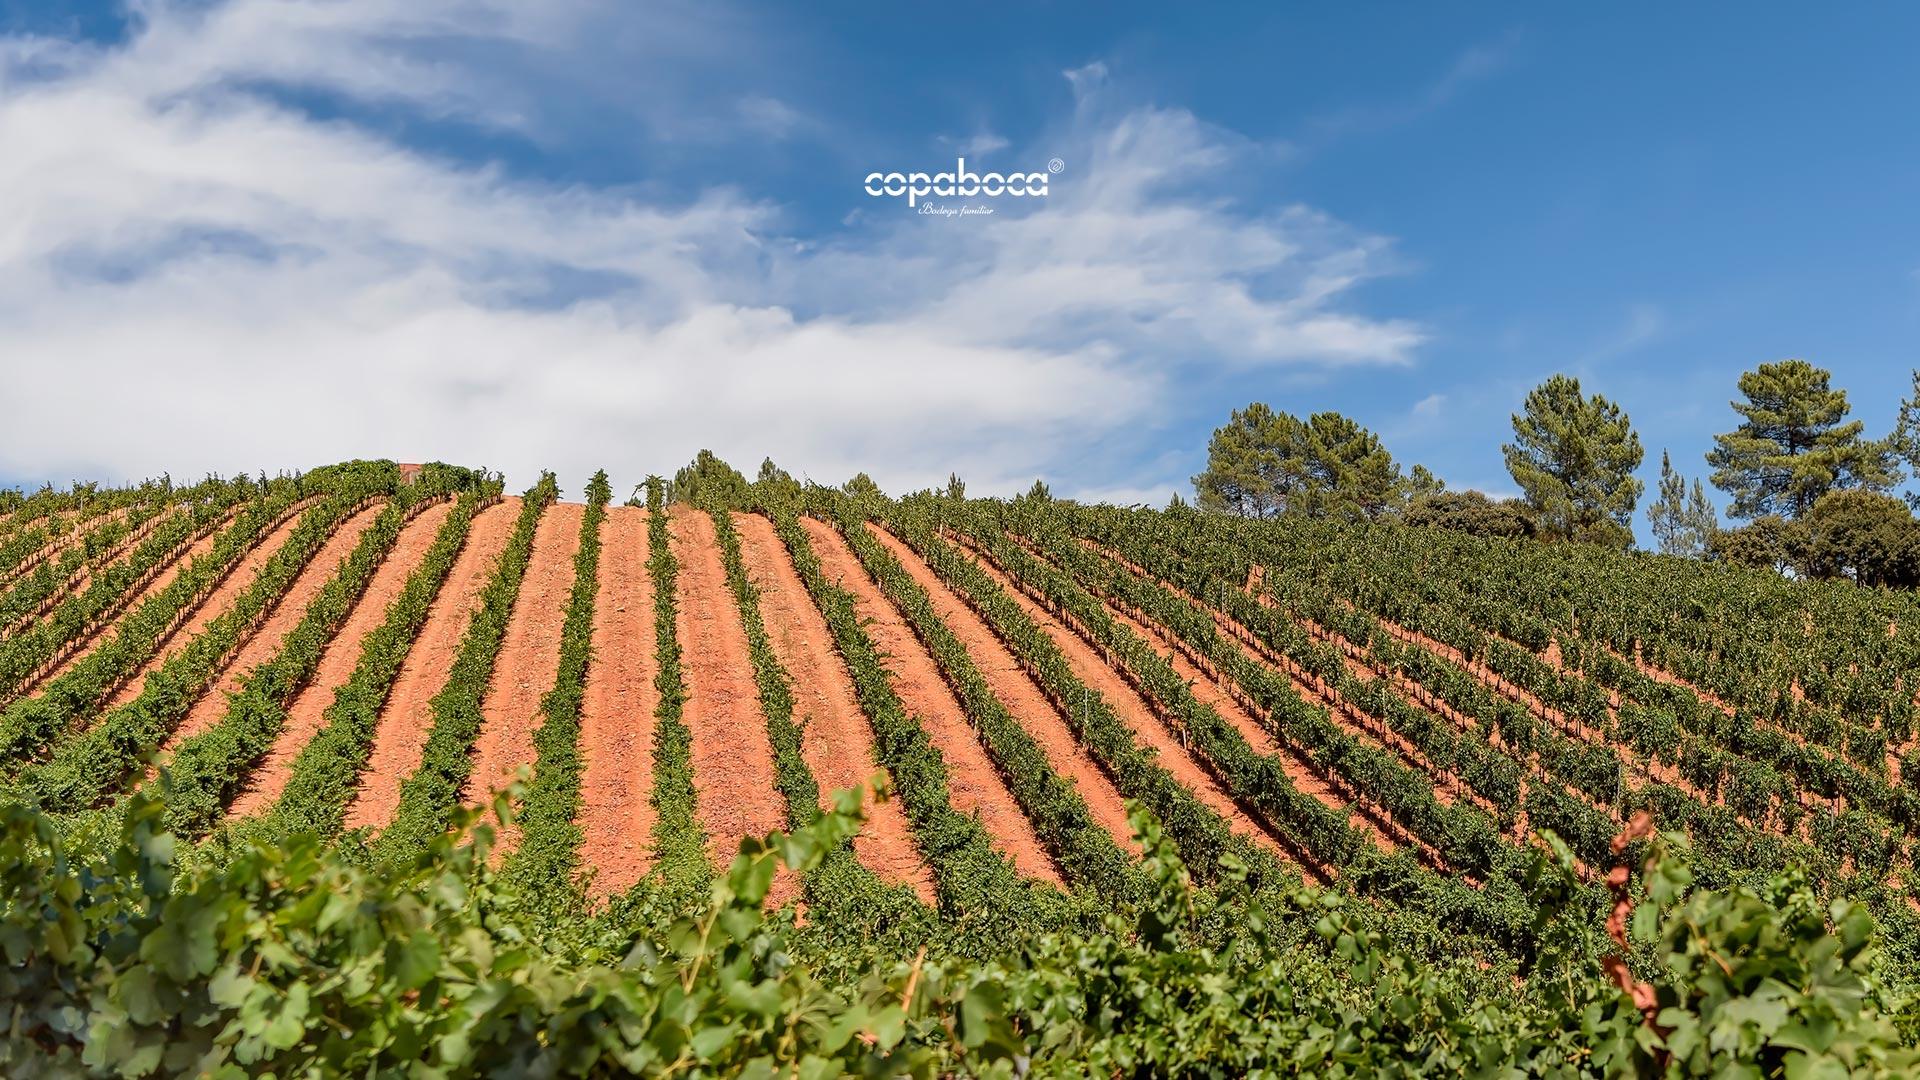 Bodegas Copaboca